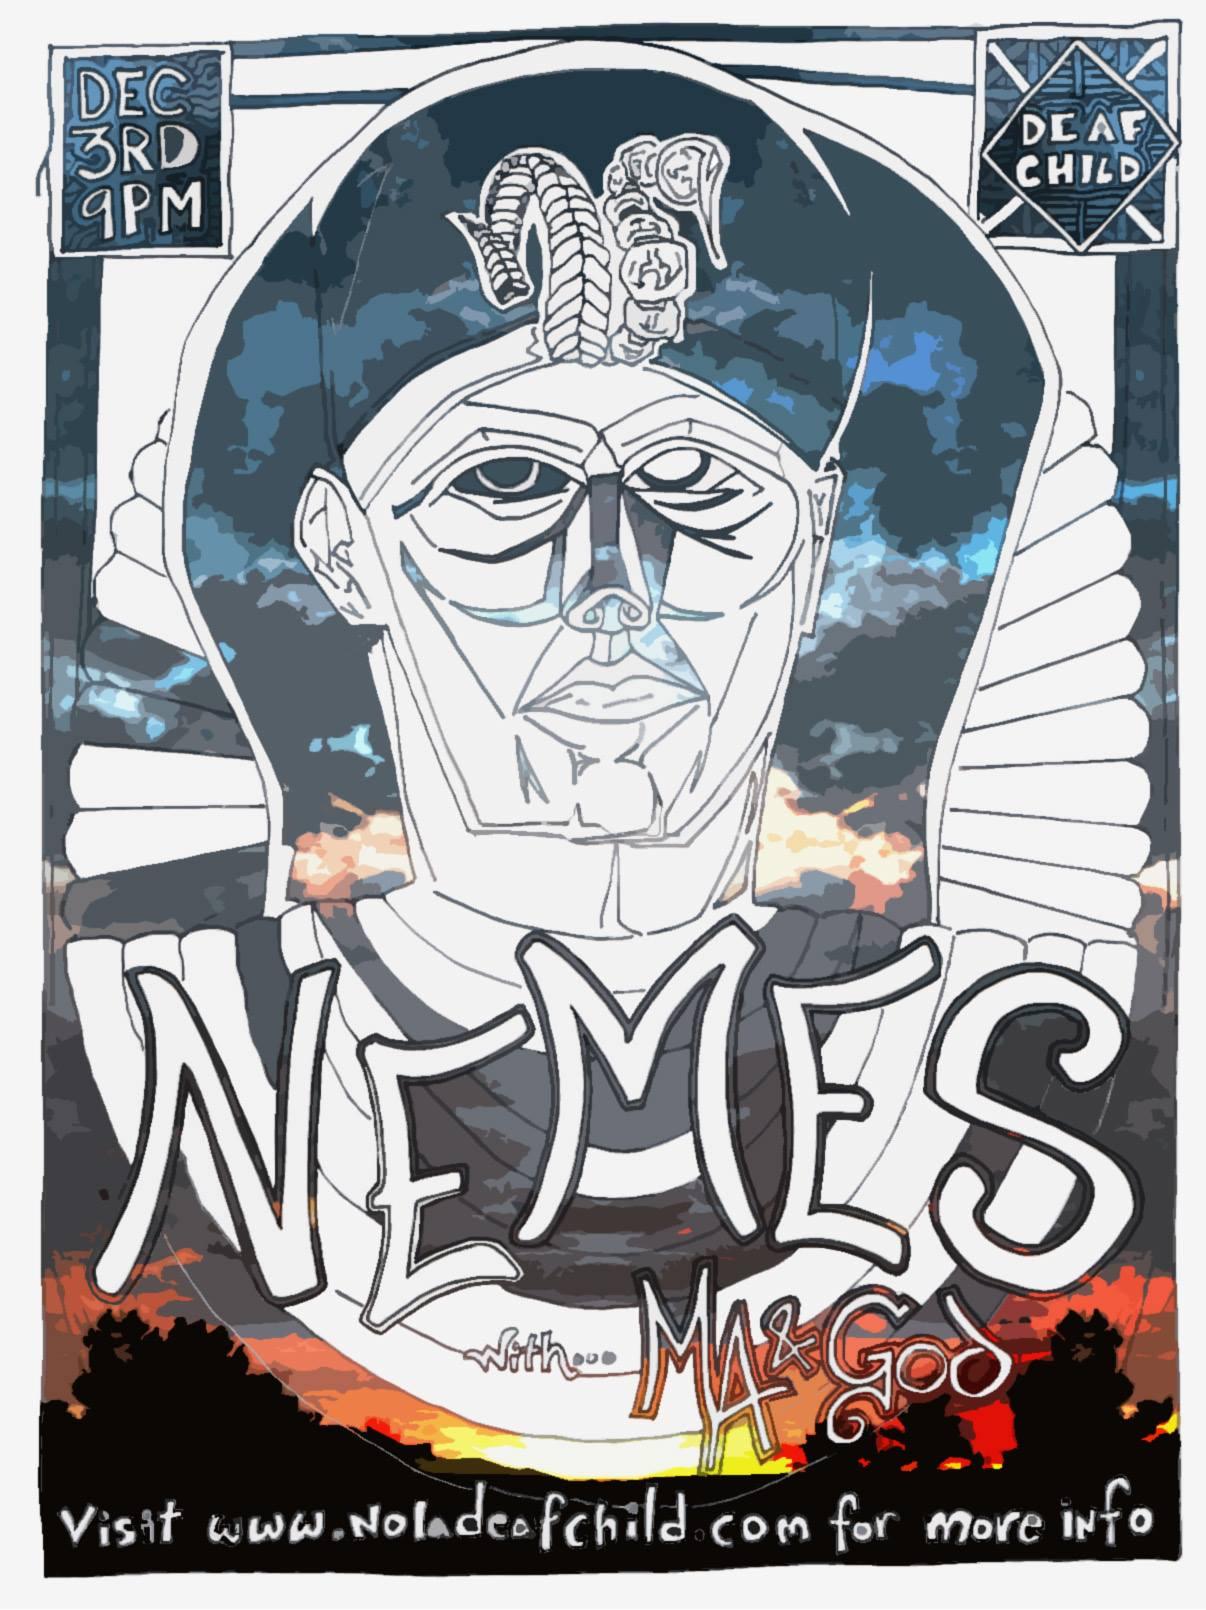 Nemes plus Ma and God 2016